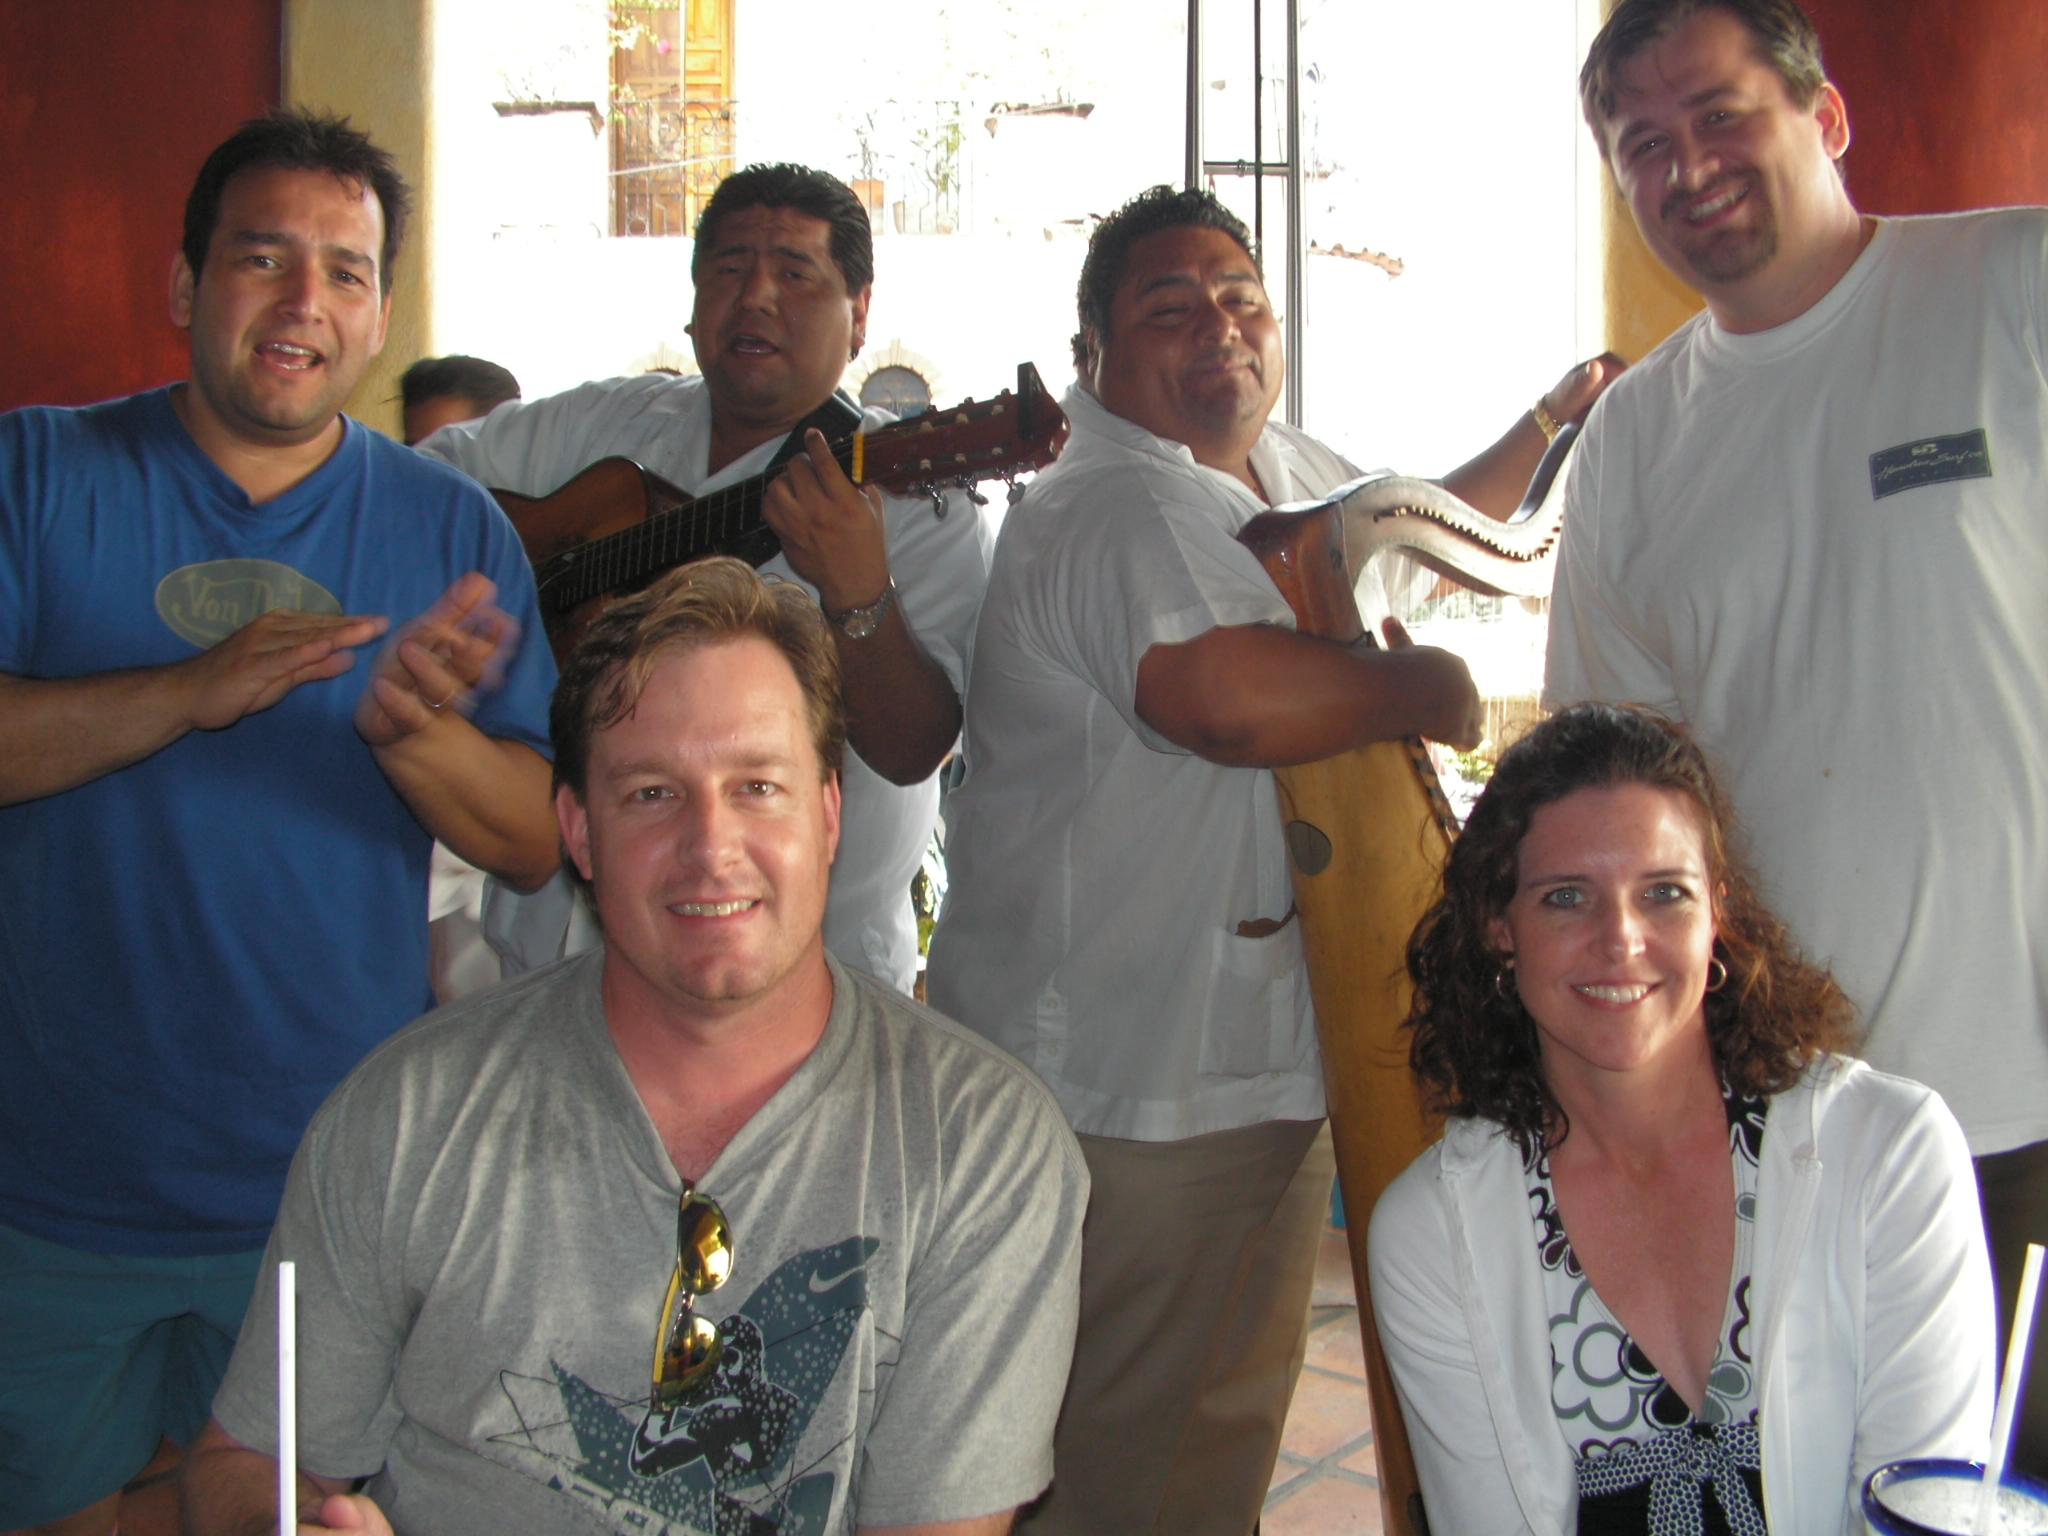 Rick and the mariachi band in puertovallarta